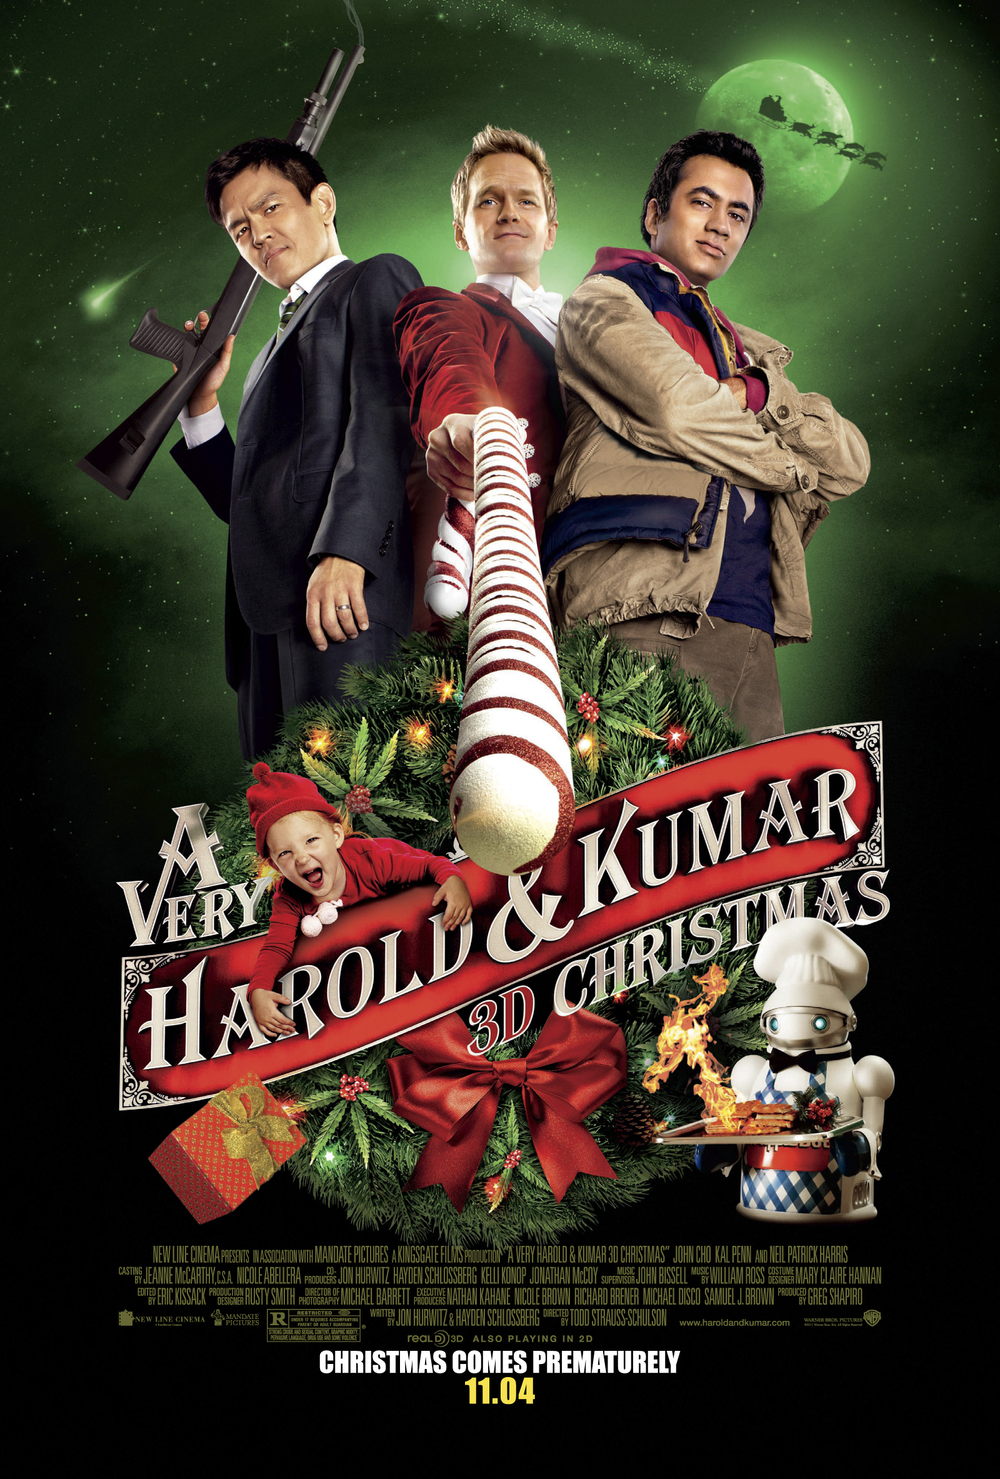 very-harold-kumar-christmas-movie-poster.jpg